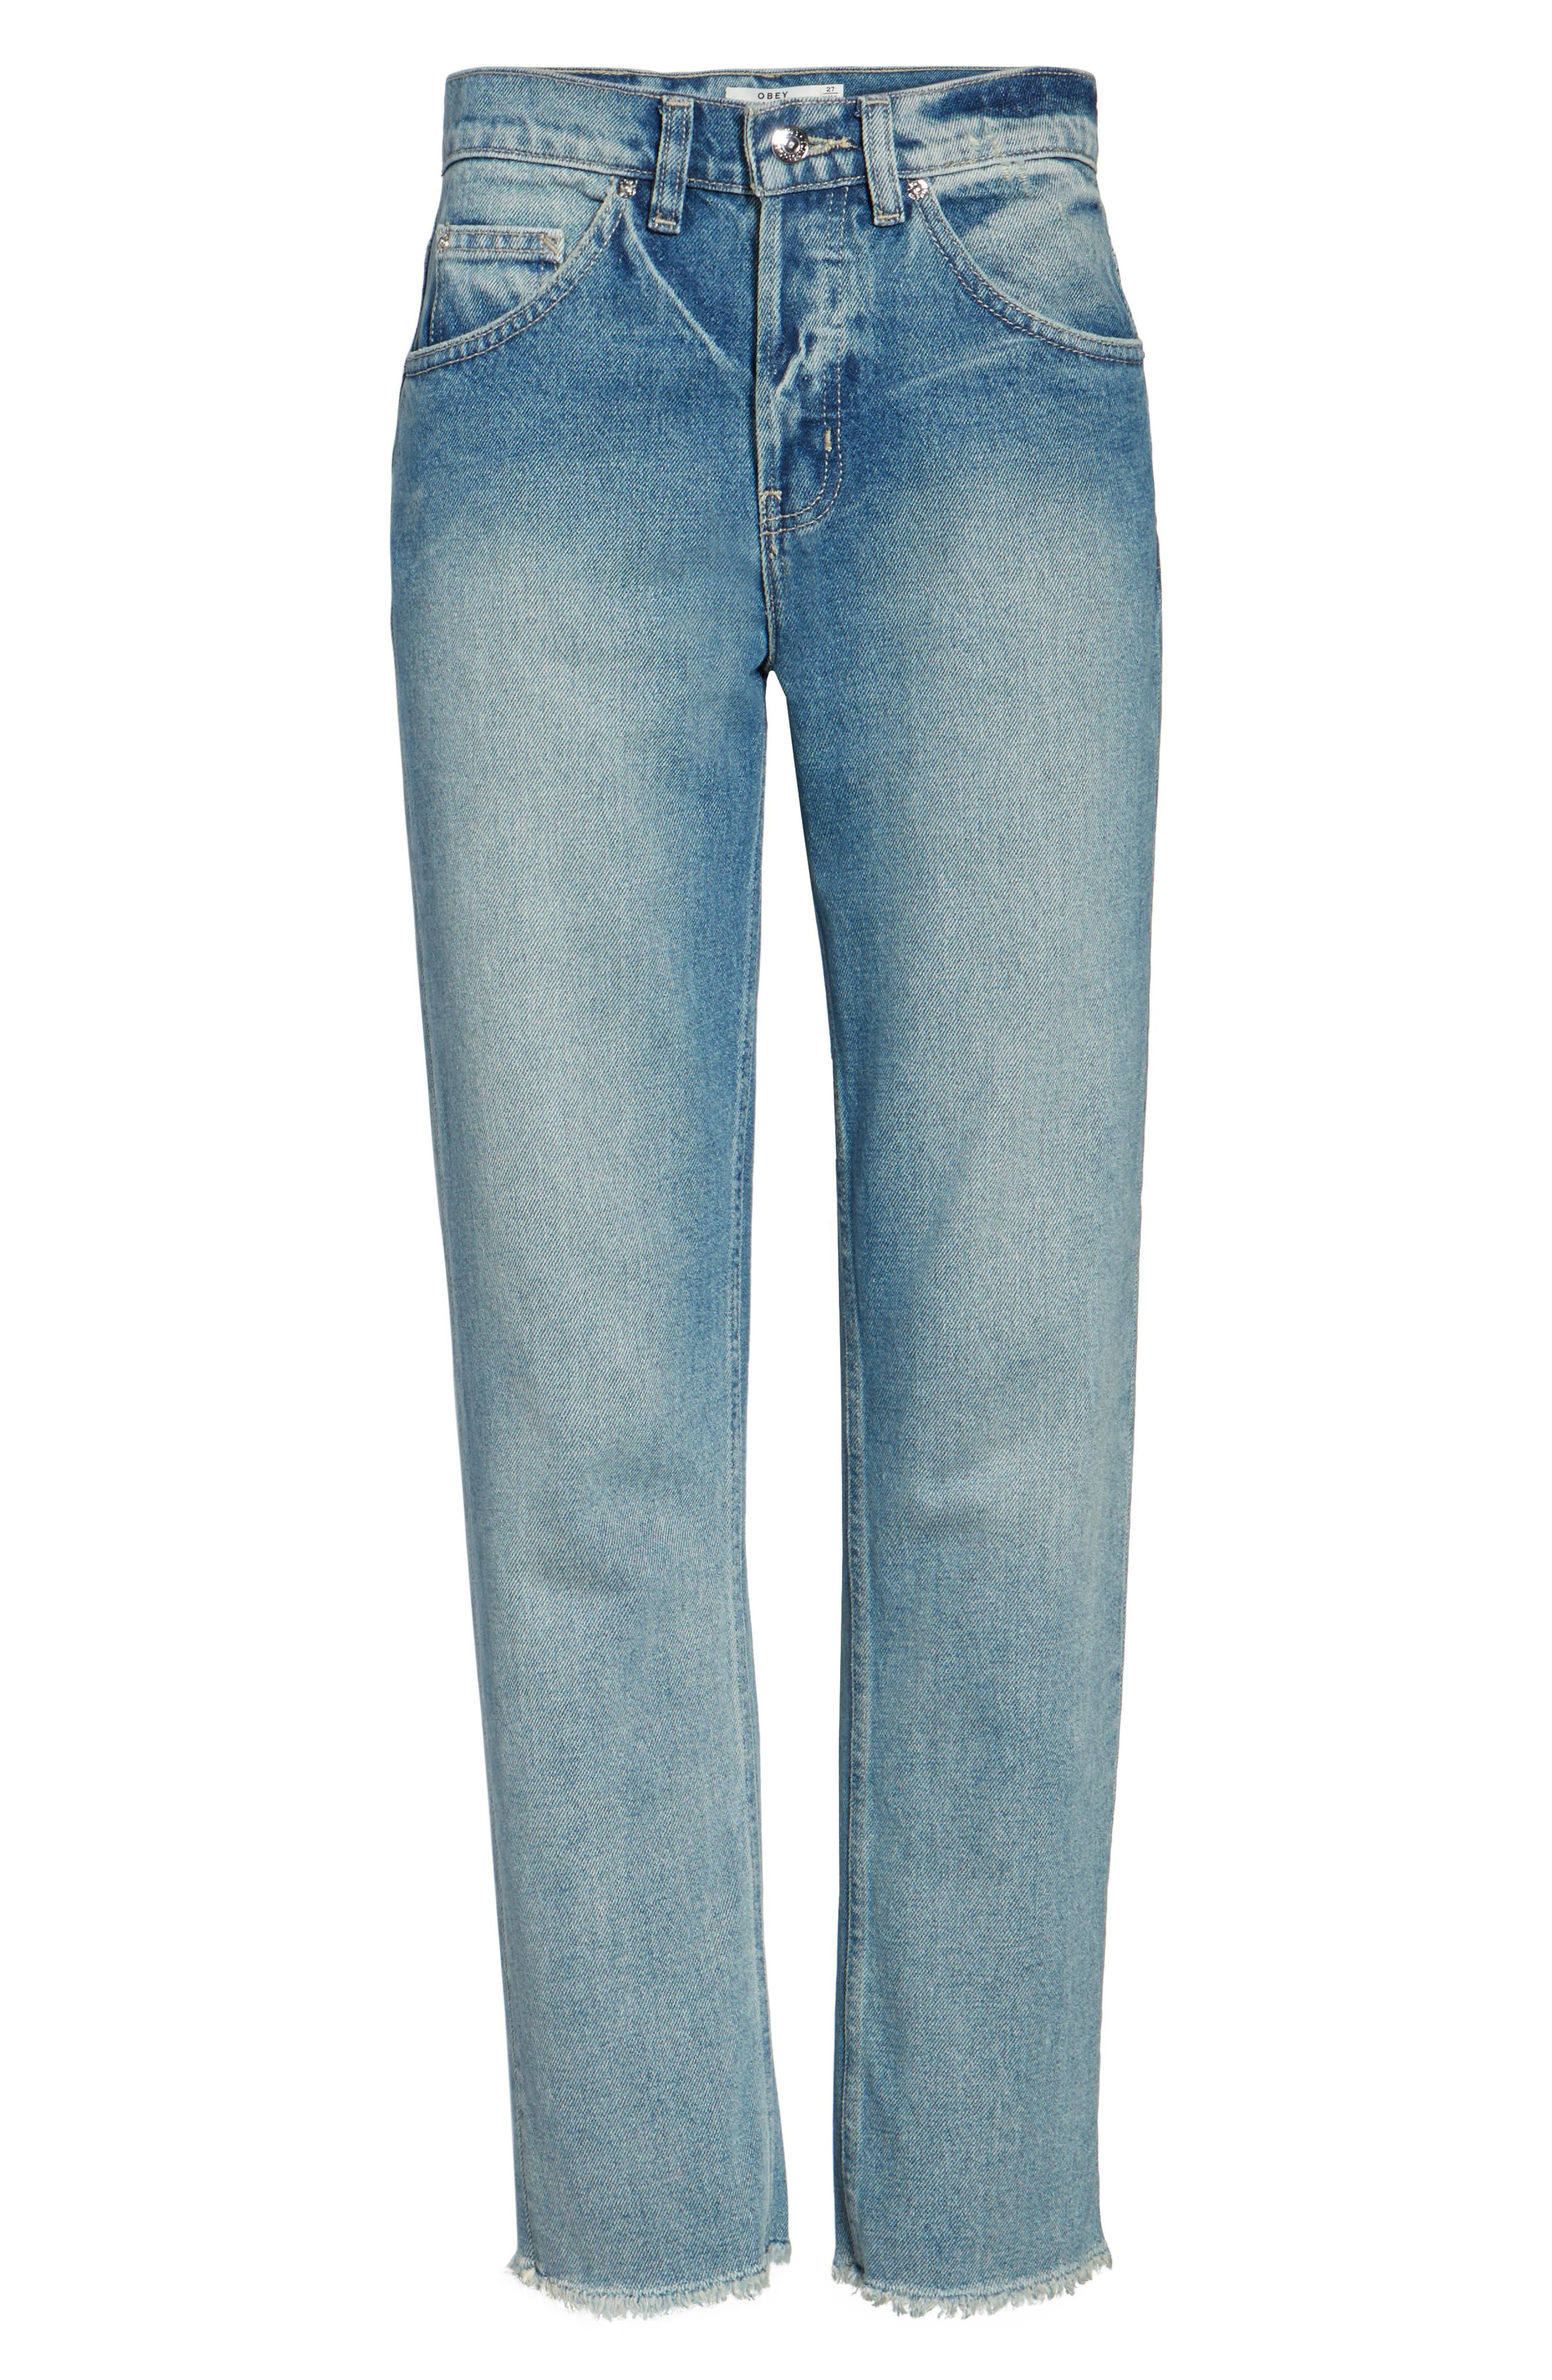 Sundays Straggler High Waist Jeans,                             Alternate thumbnail 6, color,                             400